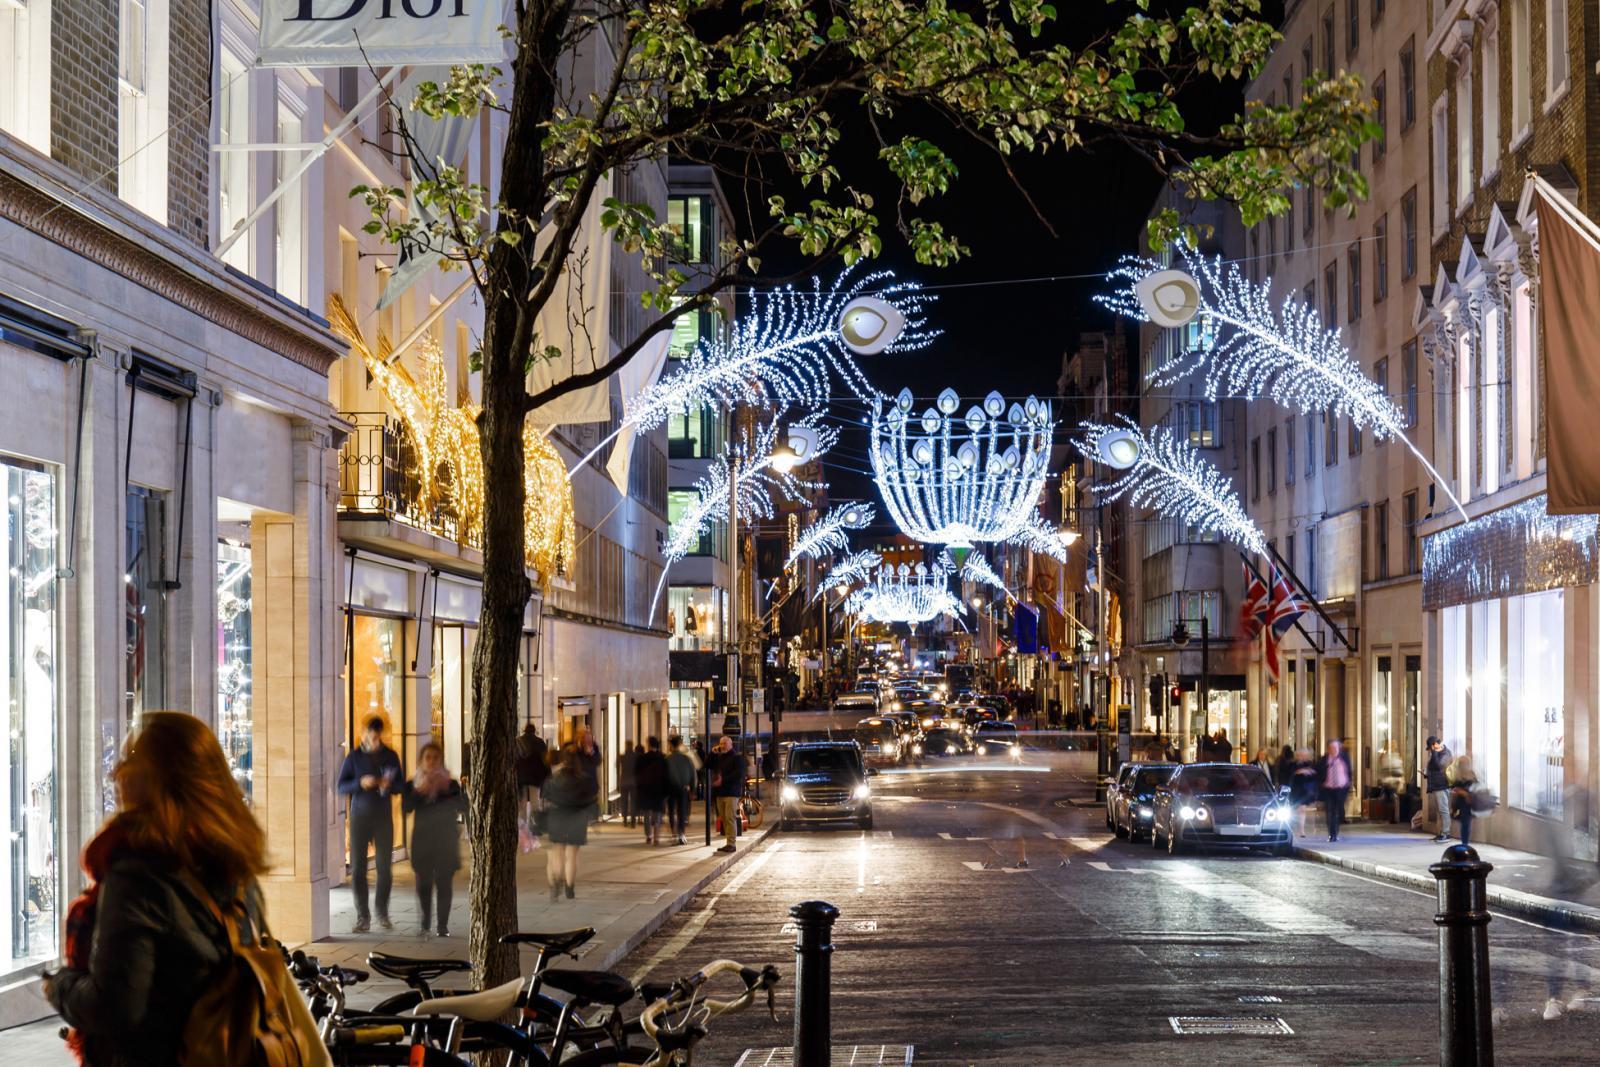 Bond Street in Mayfair, London, Shopping